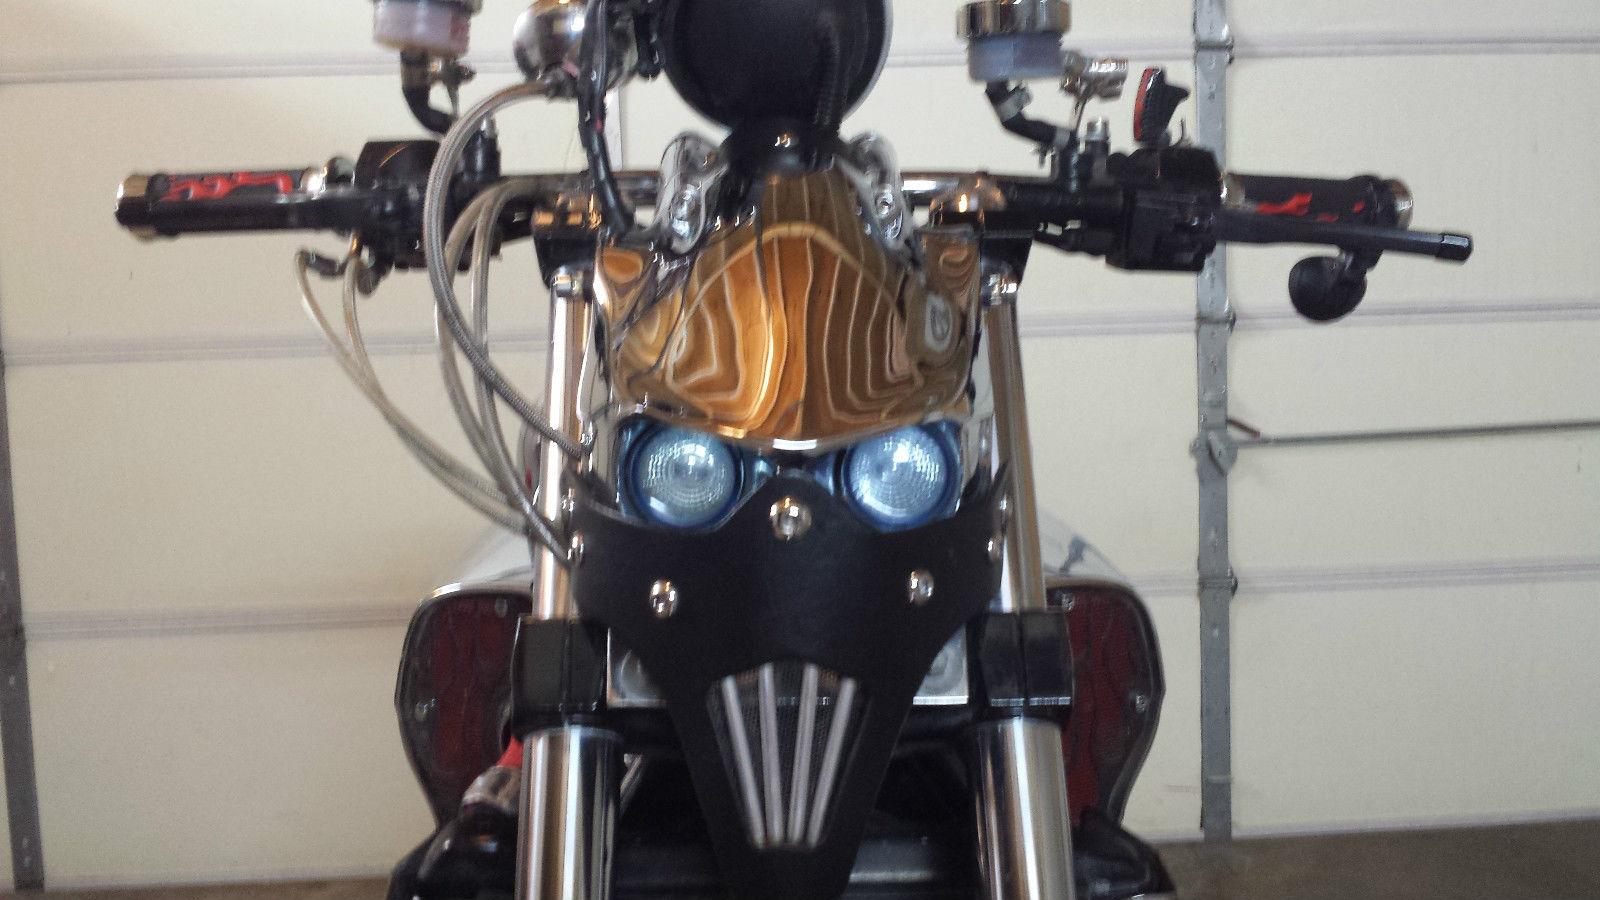 2000 Yamaha VMAX (Highly Modified)